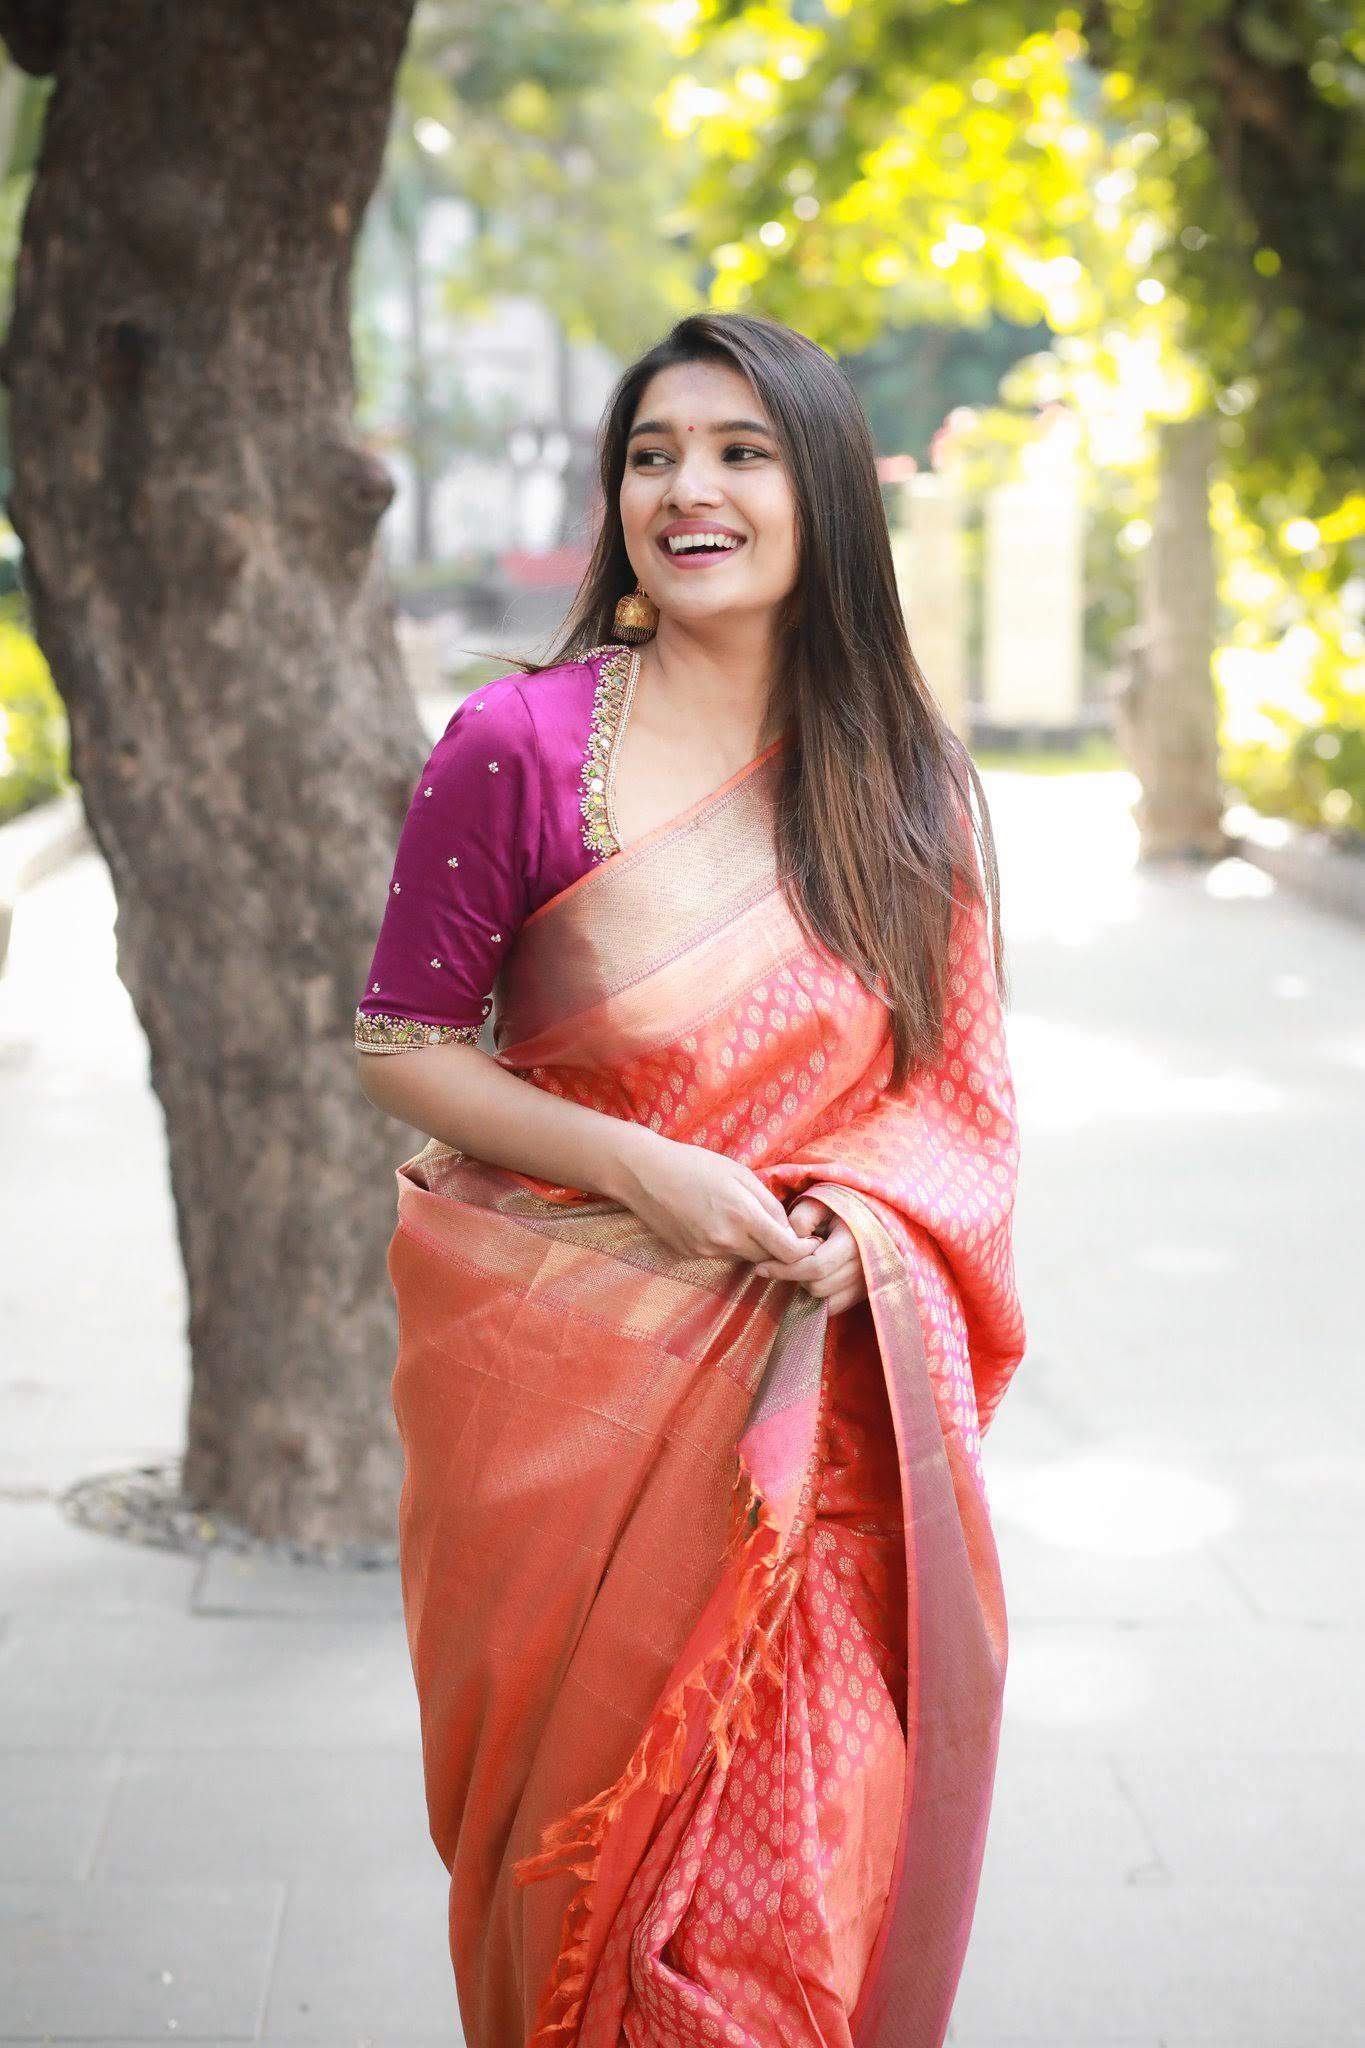 Vani-bhojan-latest-image-25